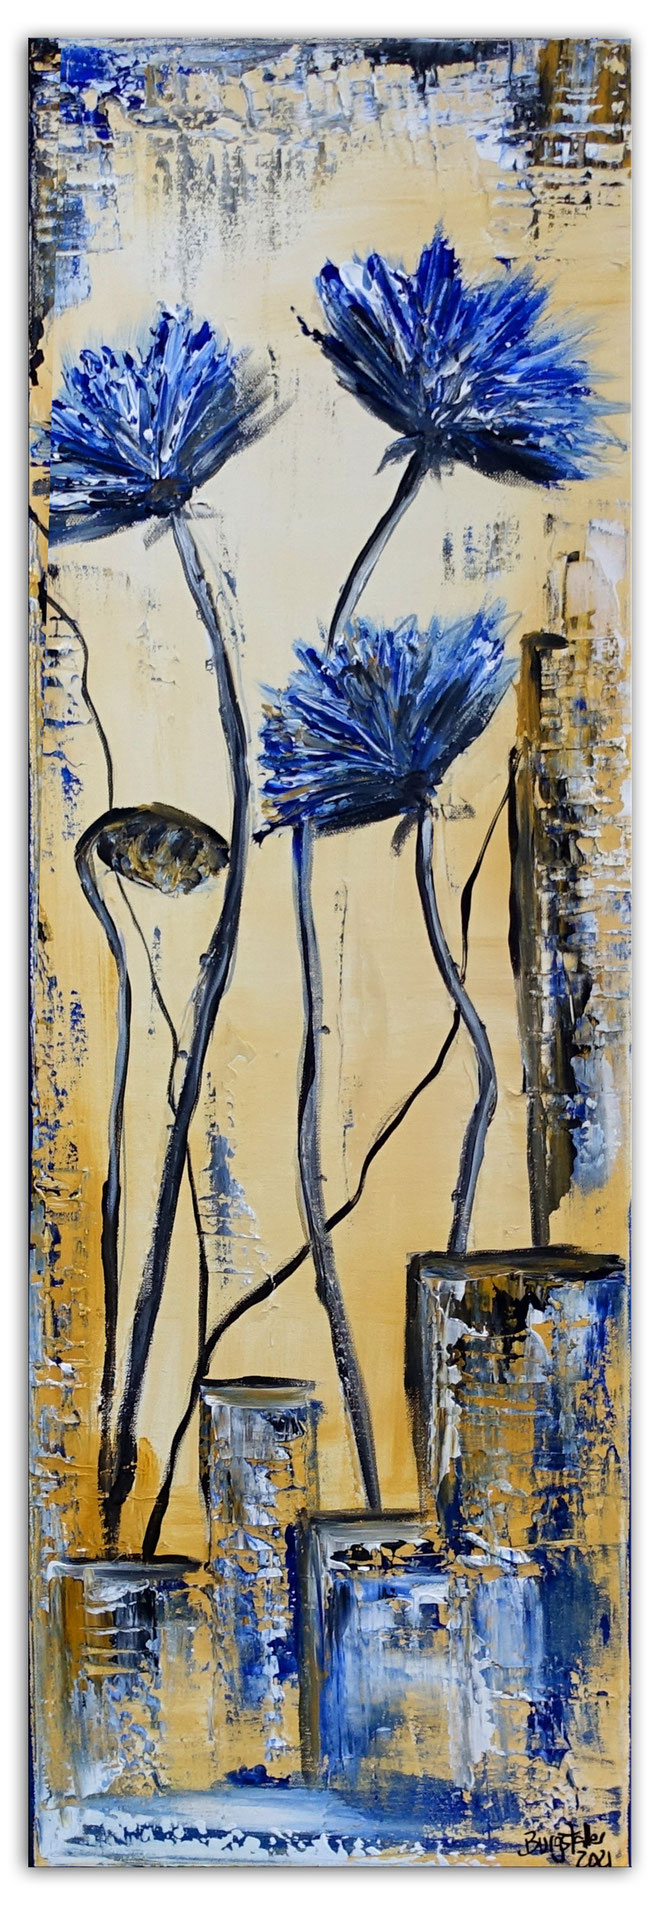 Kornblumen - Blumenmalerei - Blumen Bild Gemälde - abstrakte Kunst modern